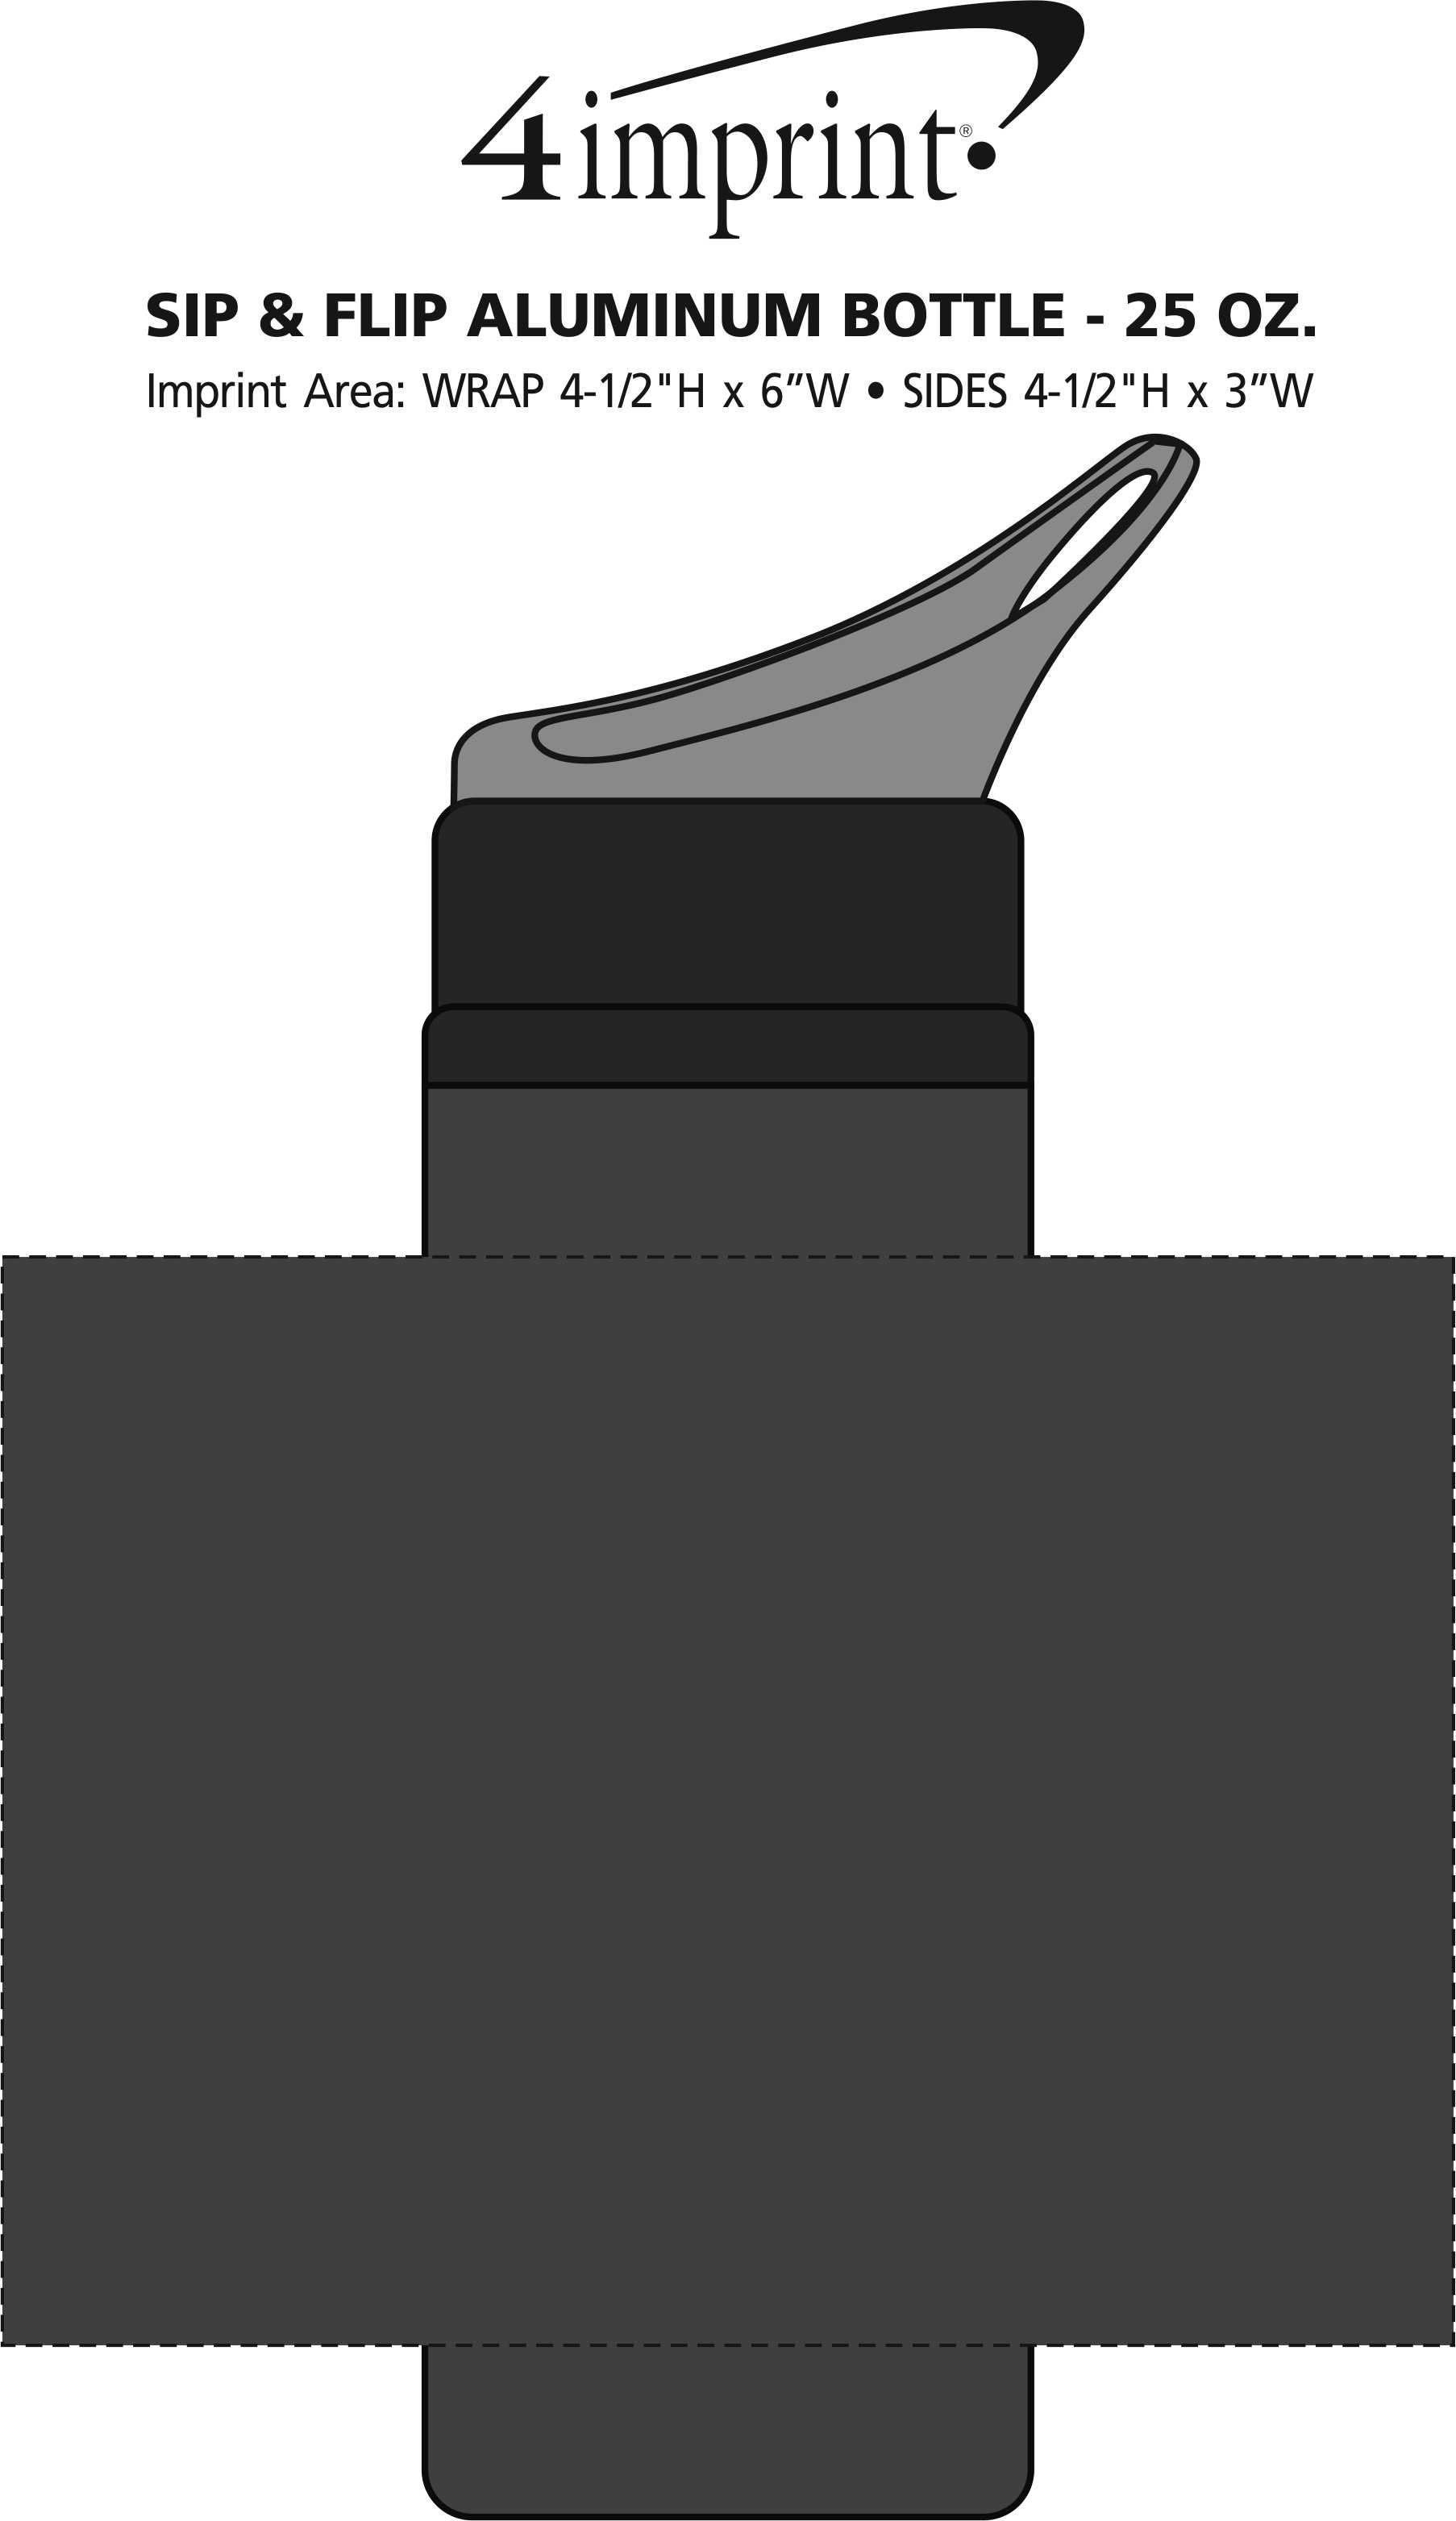 Imprint Area of Sip & Flip Aluminum Bottle - 24 oz.